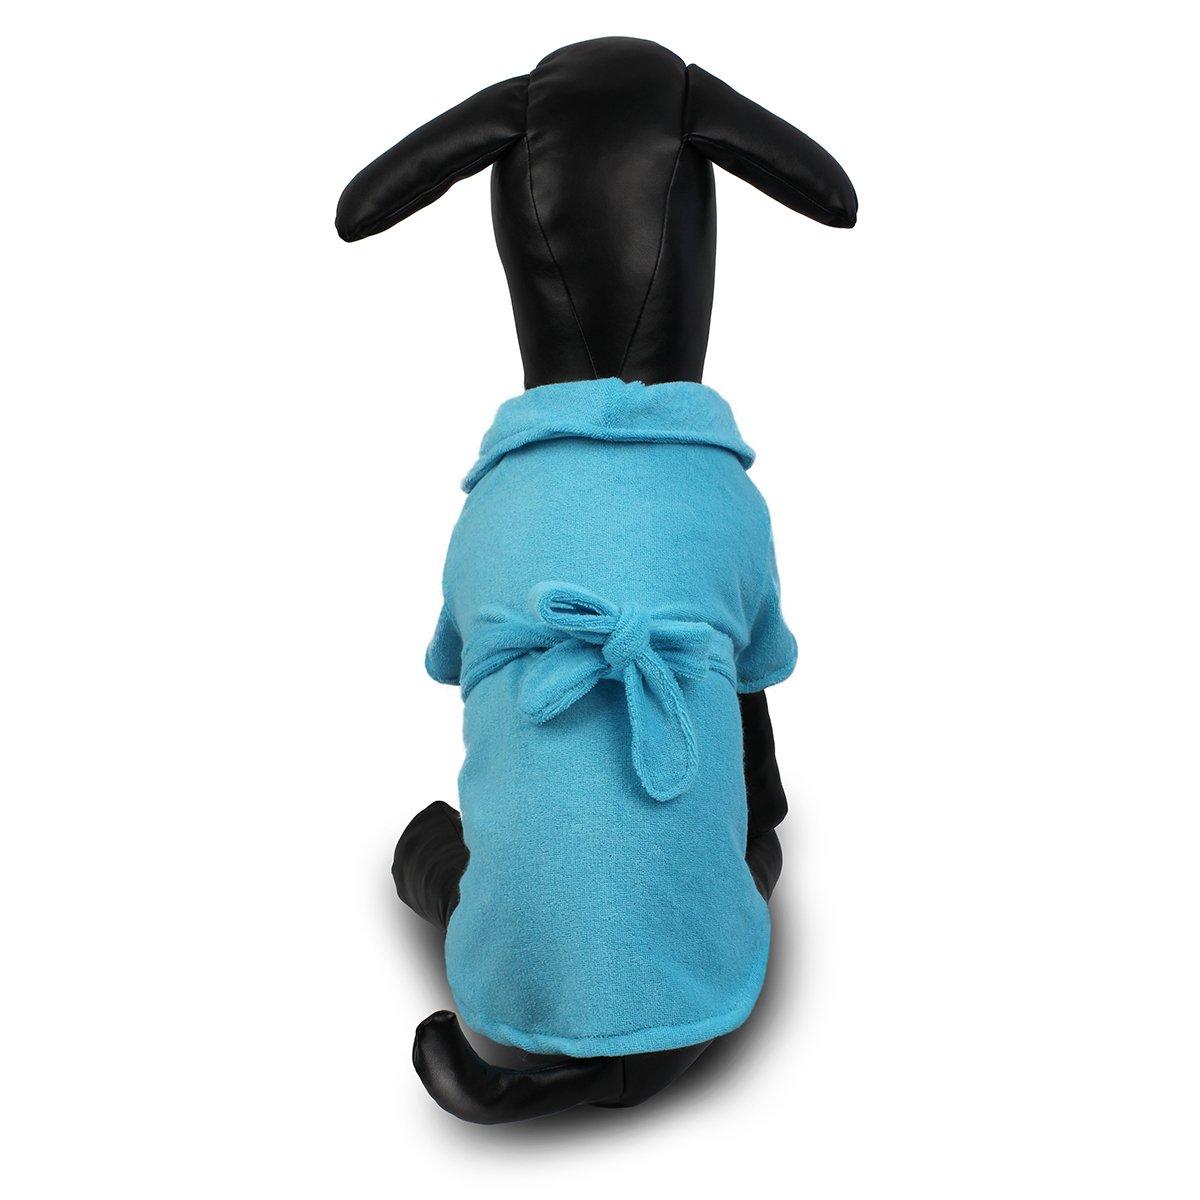 Lovely Elegant Dog Pajamas Pet bathrobe Dog Nighty Winter Soft Pet Pajamas Indoor Apparel for Dogs (S, Blue)